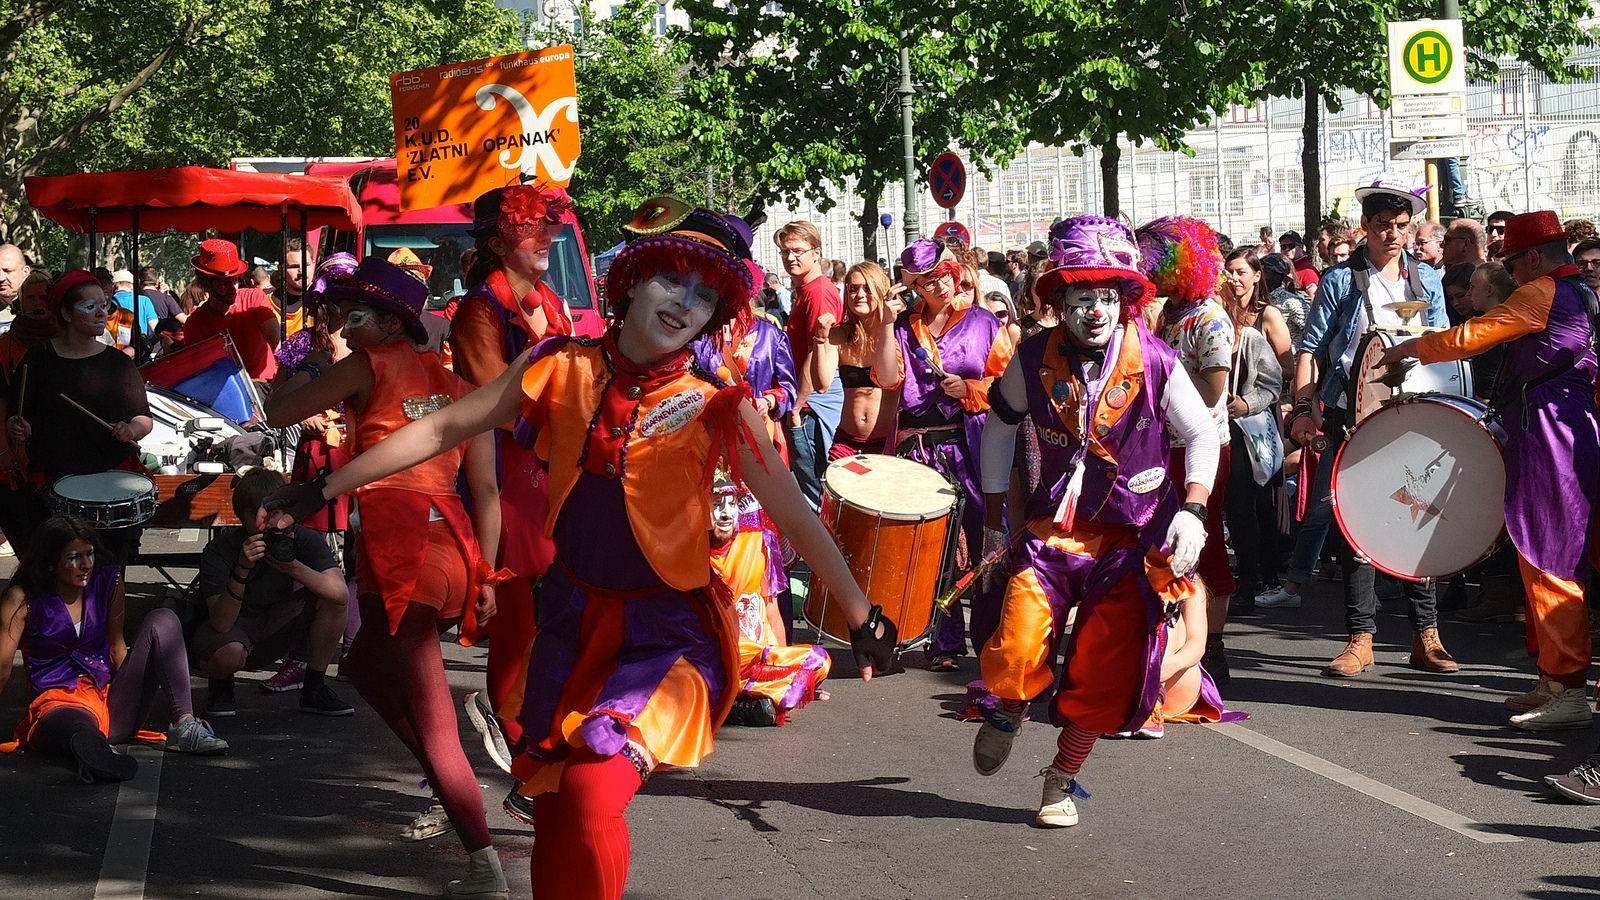 karnevalderkulturen7 KdK   Karneval der Kulturen in Berlin (Carnival of Cultures)